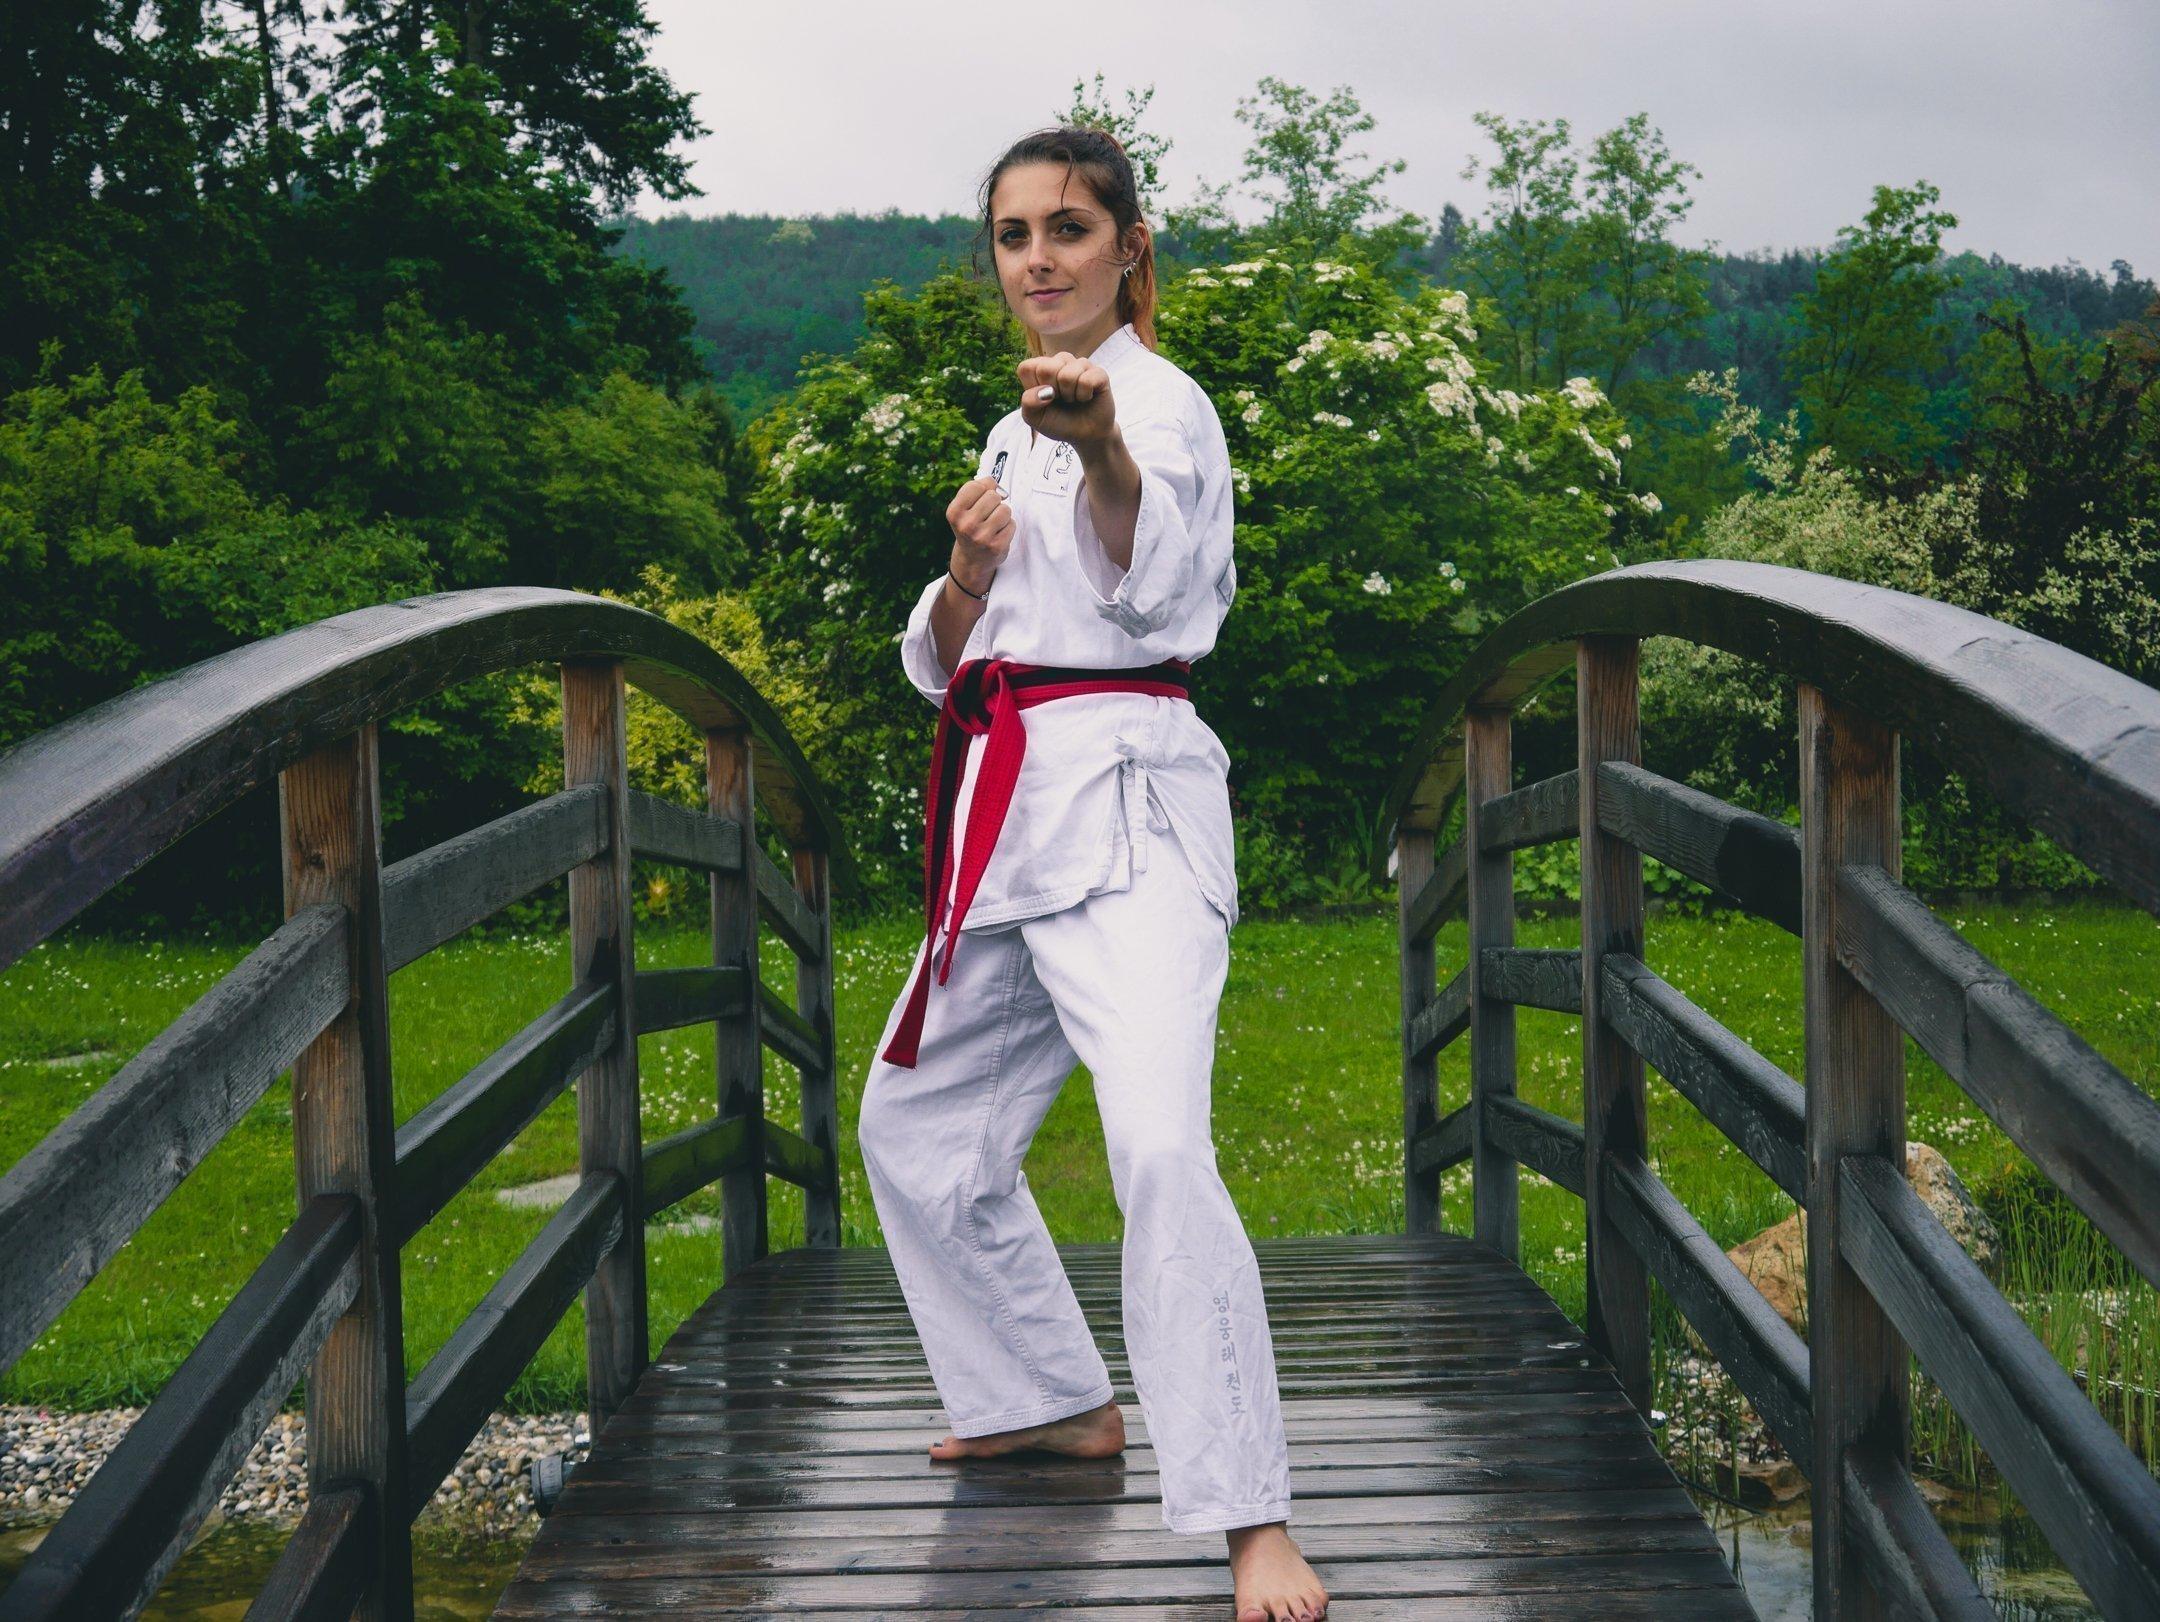 YOUNG-UNG Taekwondo Krems Laura Schrenk Dinstlgasse Kampfsport